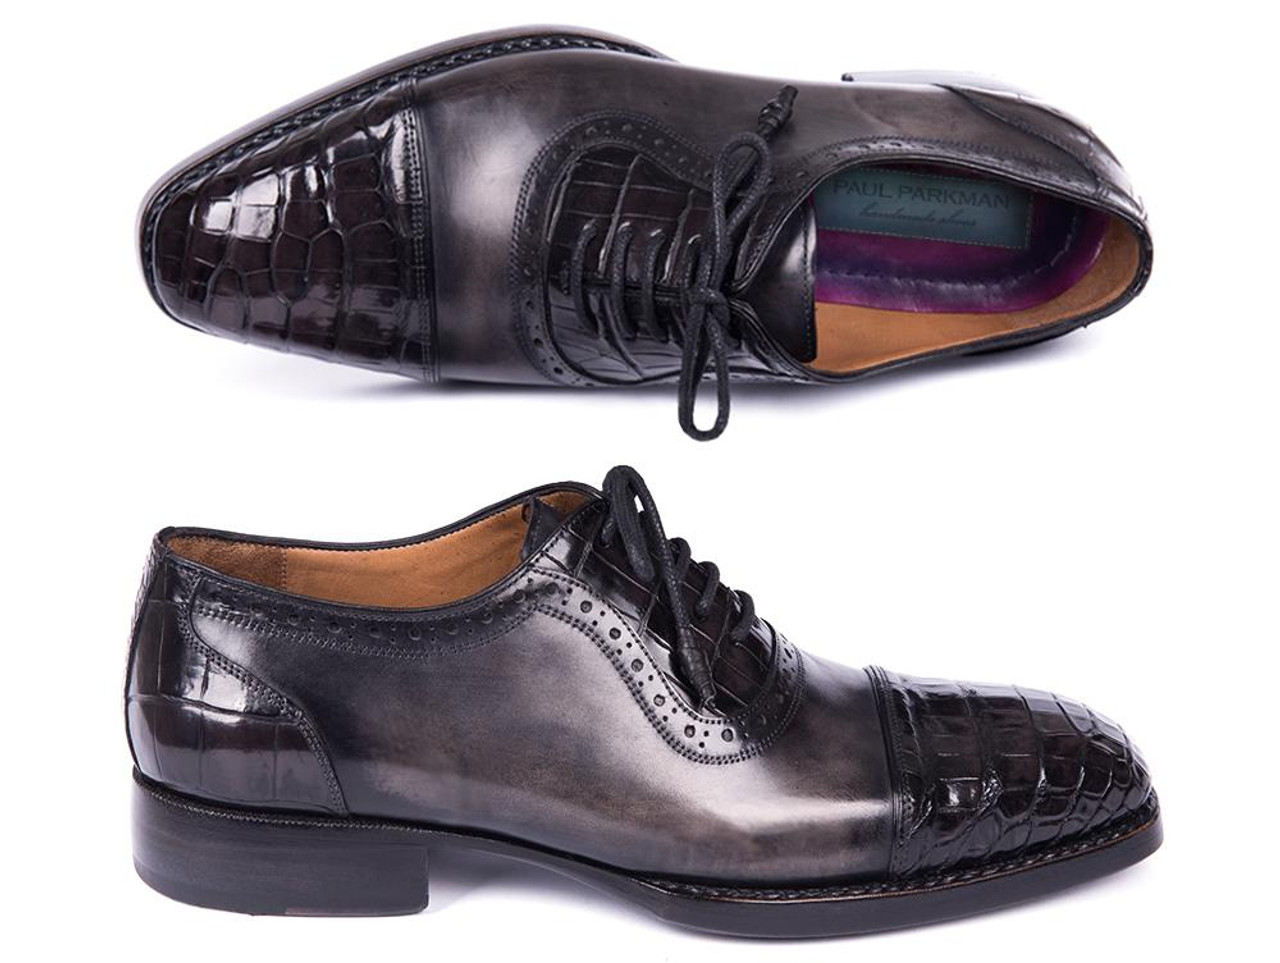 0f5c5e5e2922d Paul Parkman Black Genuine Crocodile & Gray Calfskin Captoe Oxfords  (ID#847-BLK)